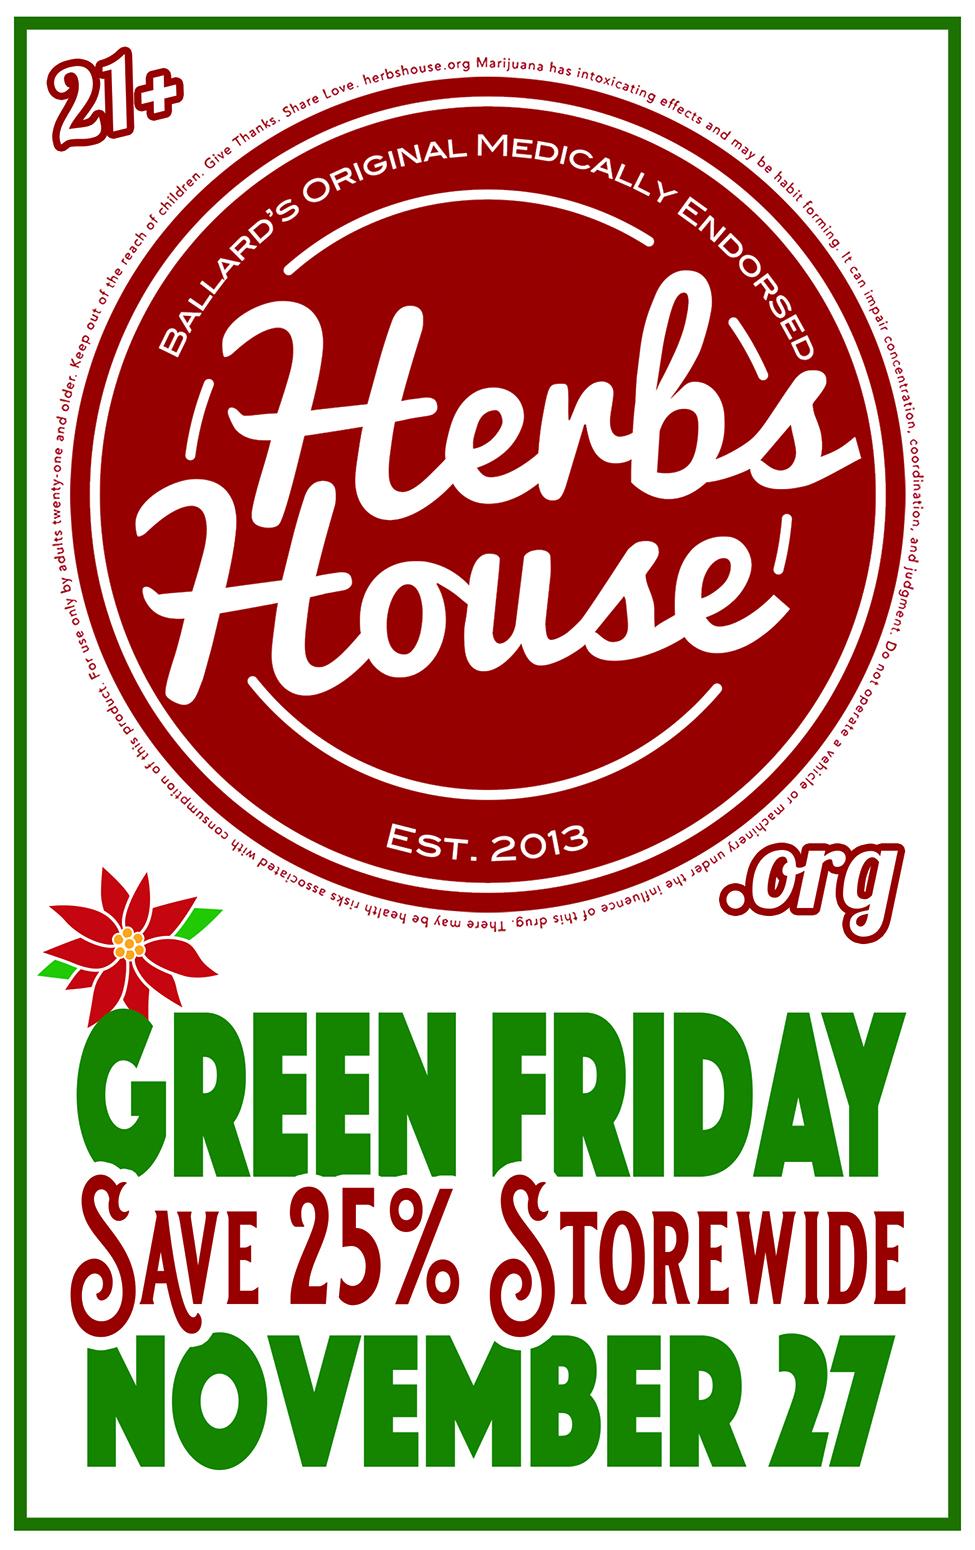 Nov 27 Green Friday Sale